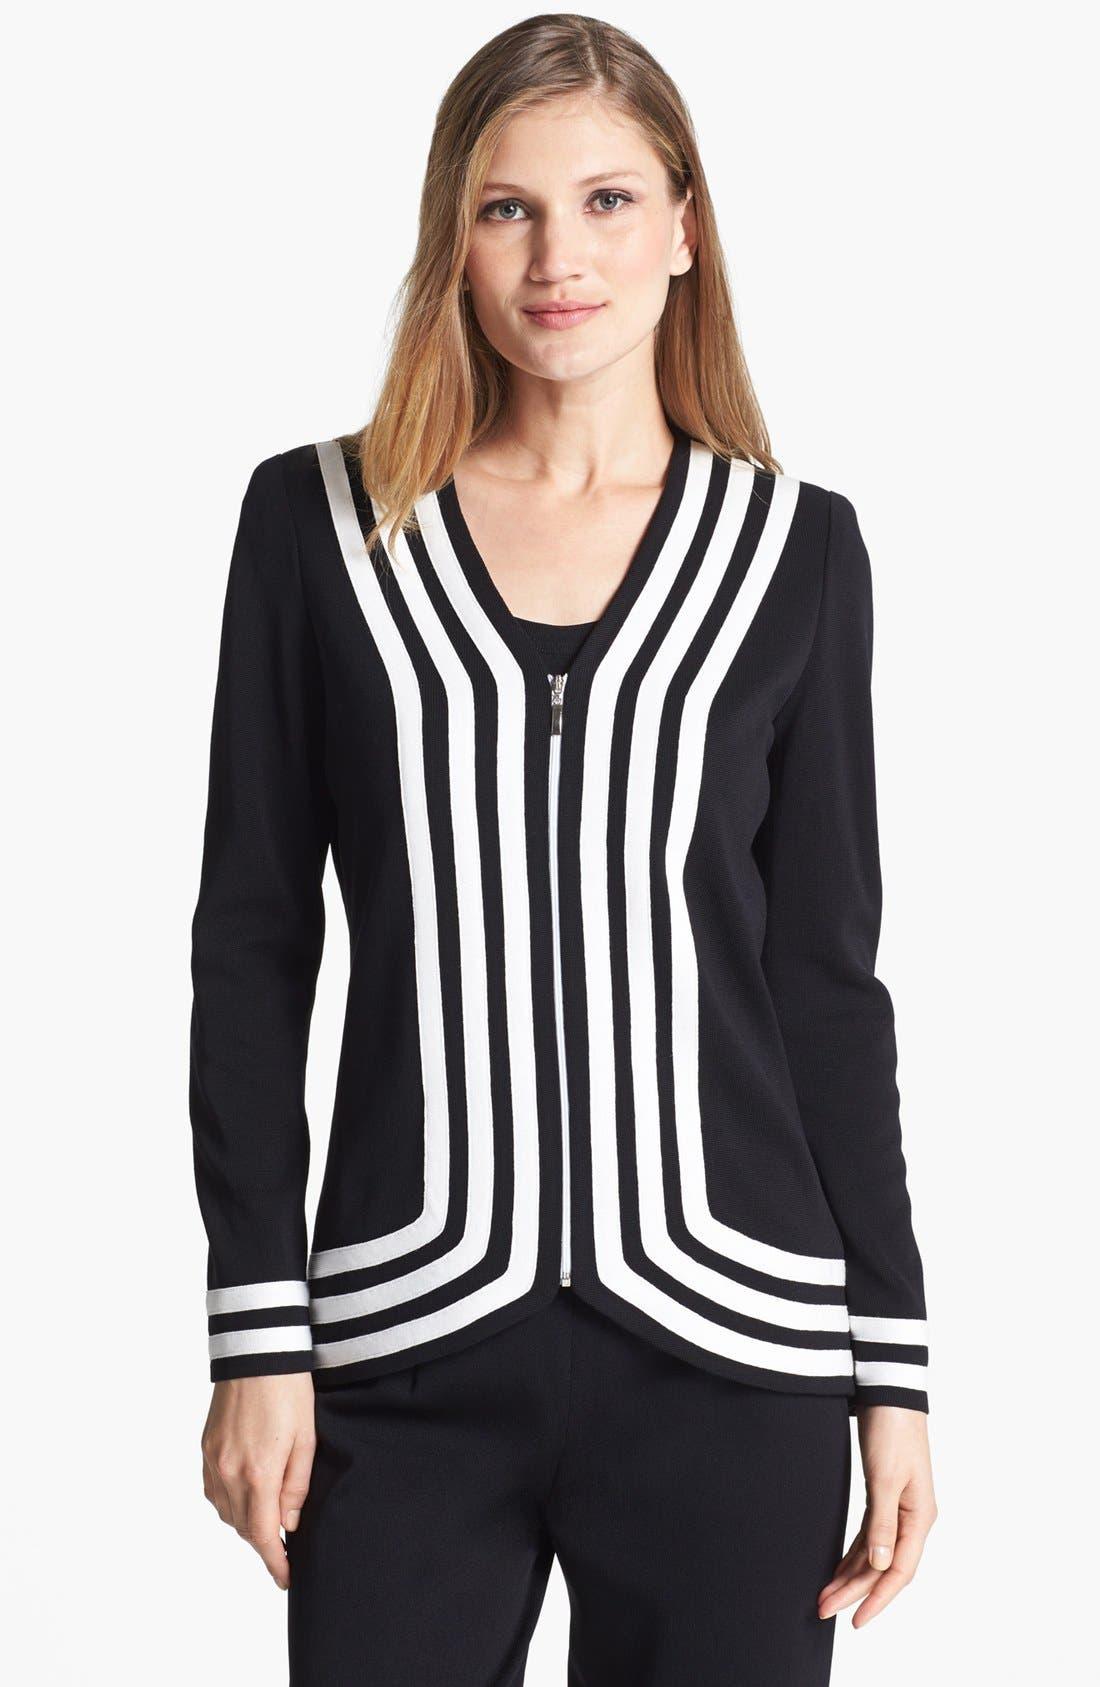 Alternate Image 1 Selected - Misook 'Bianca' Knit Jacket